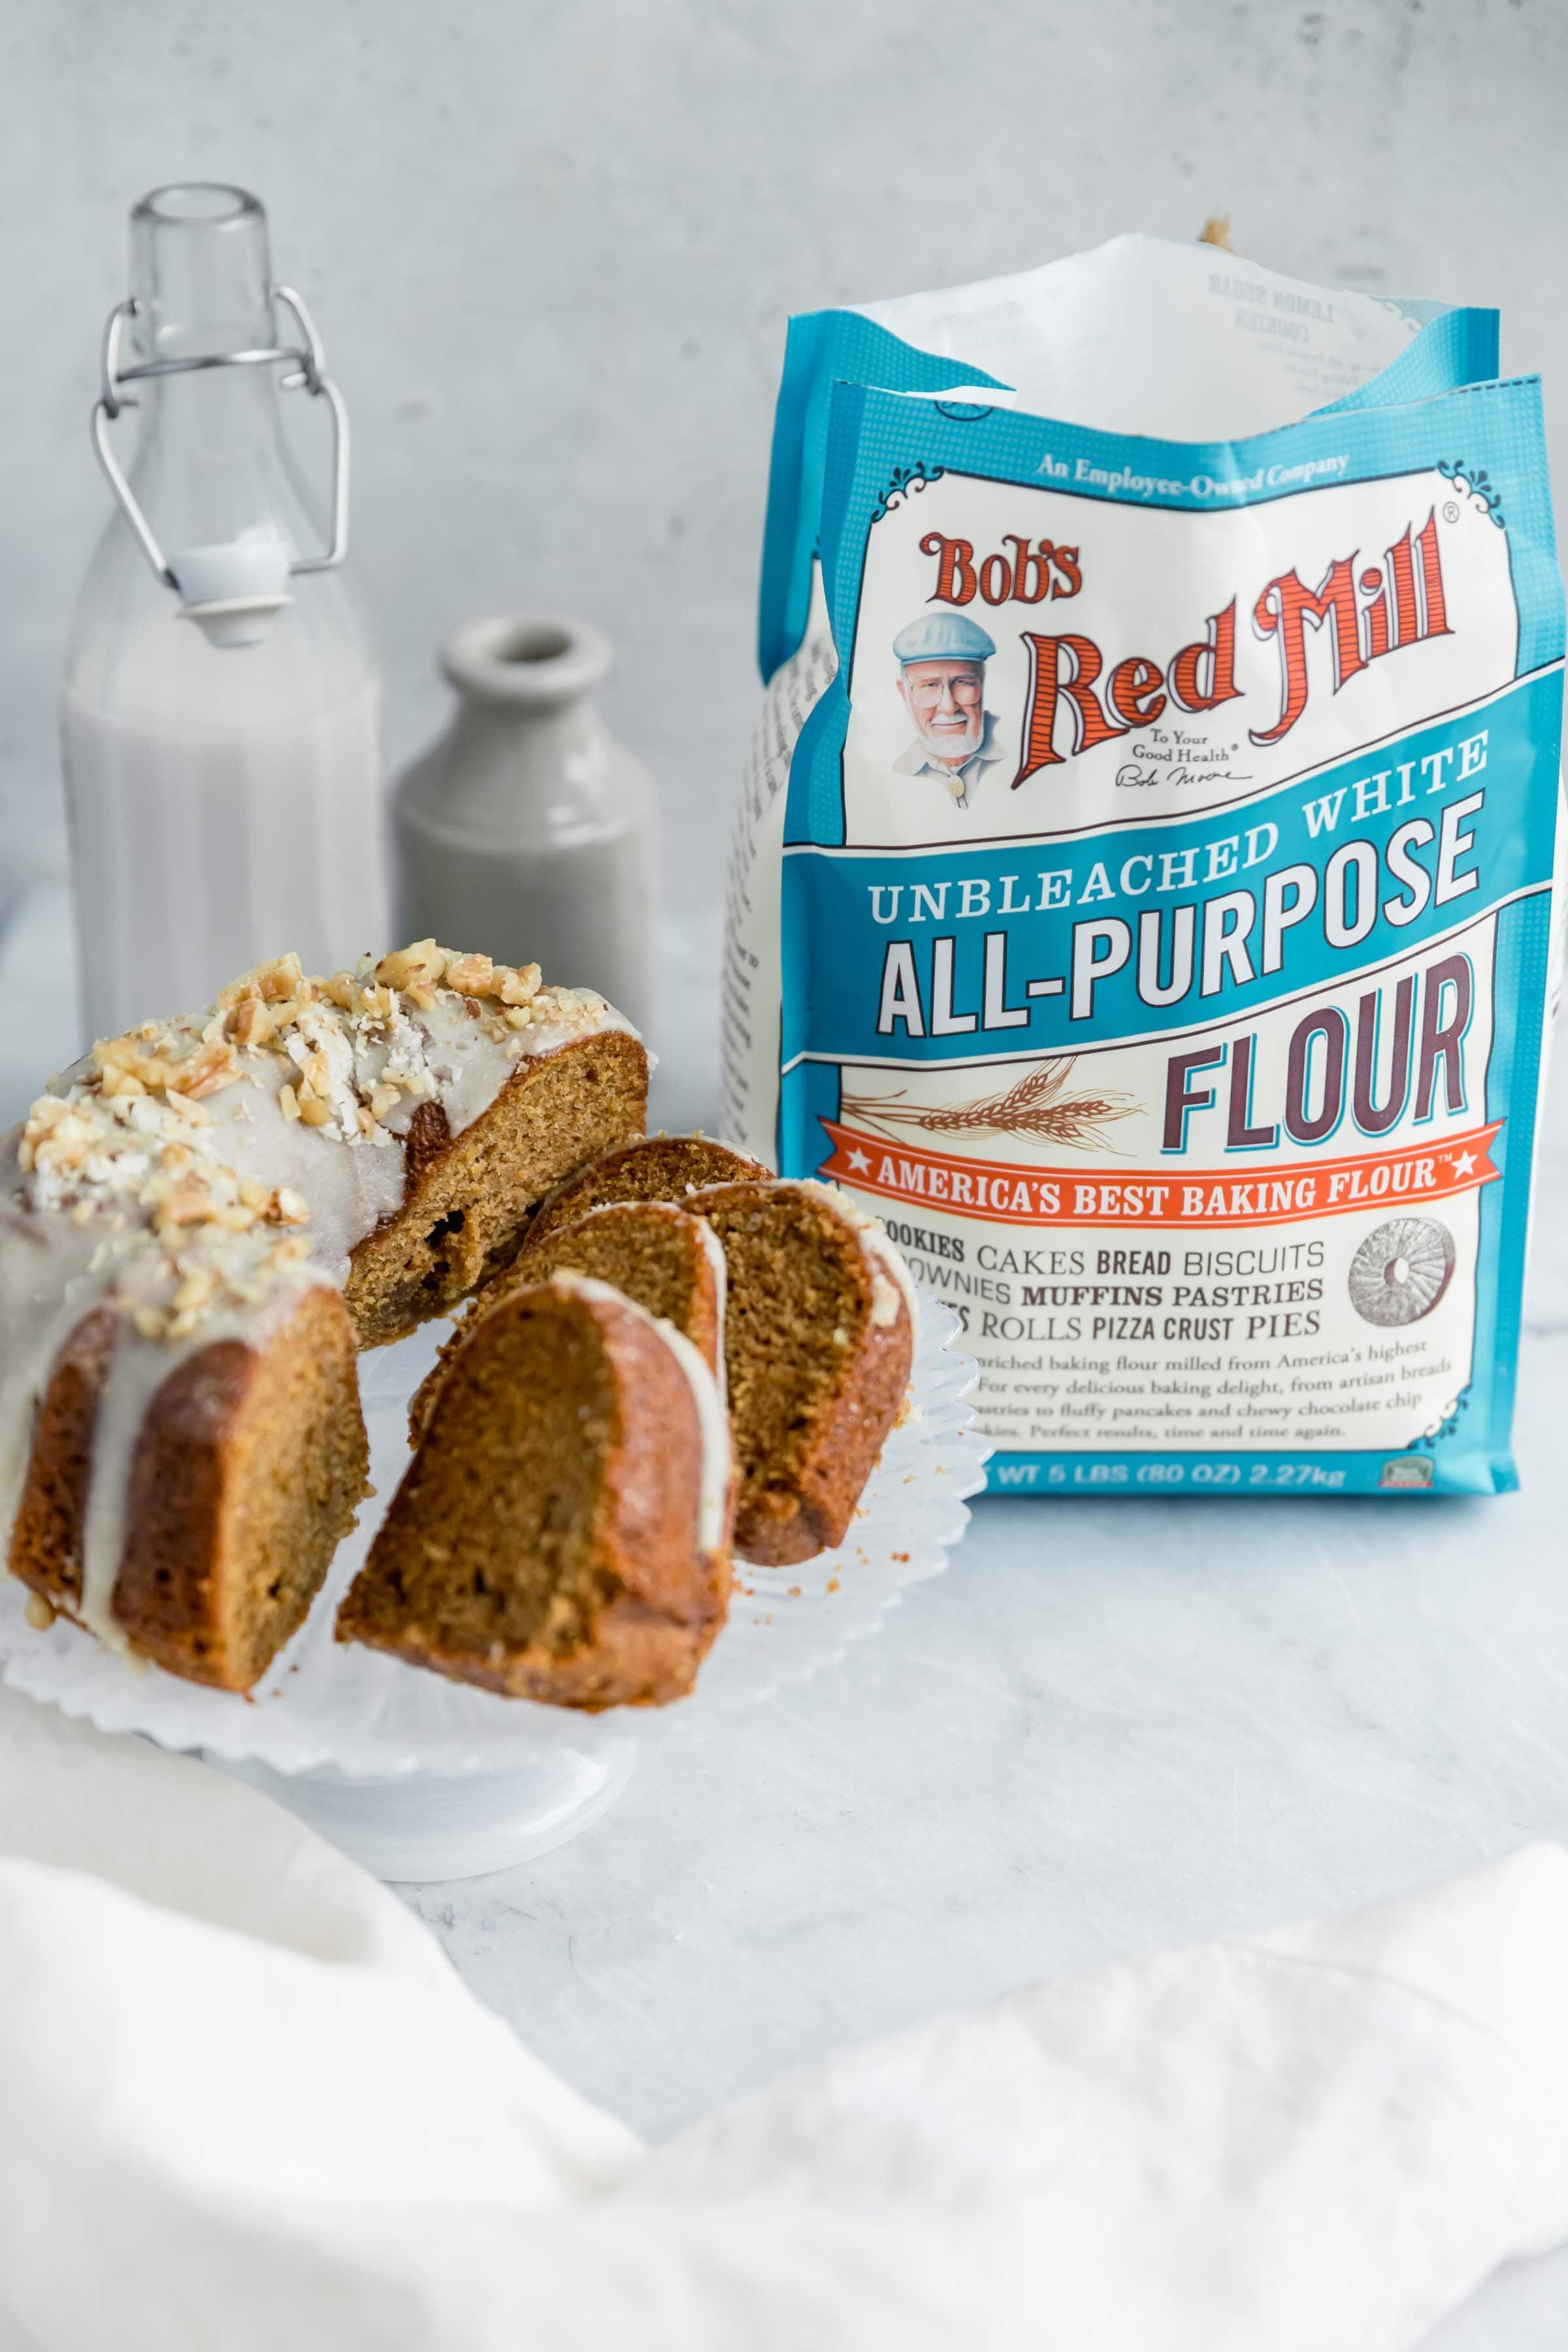 sweet potato bundtc ake with bob's flour